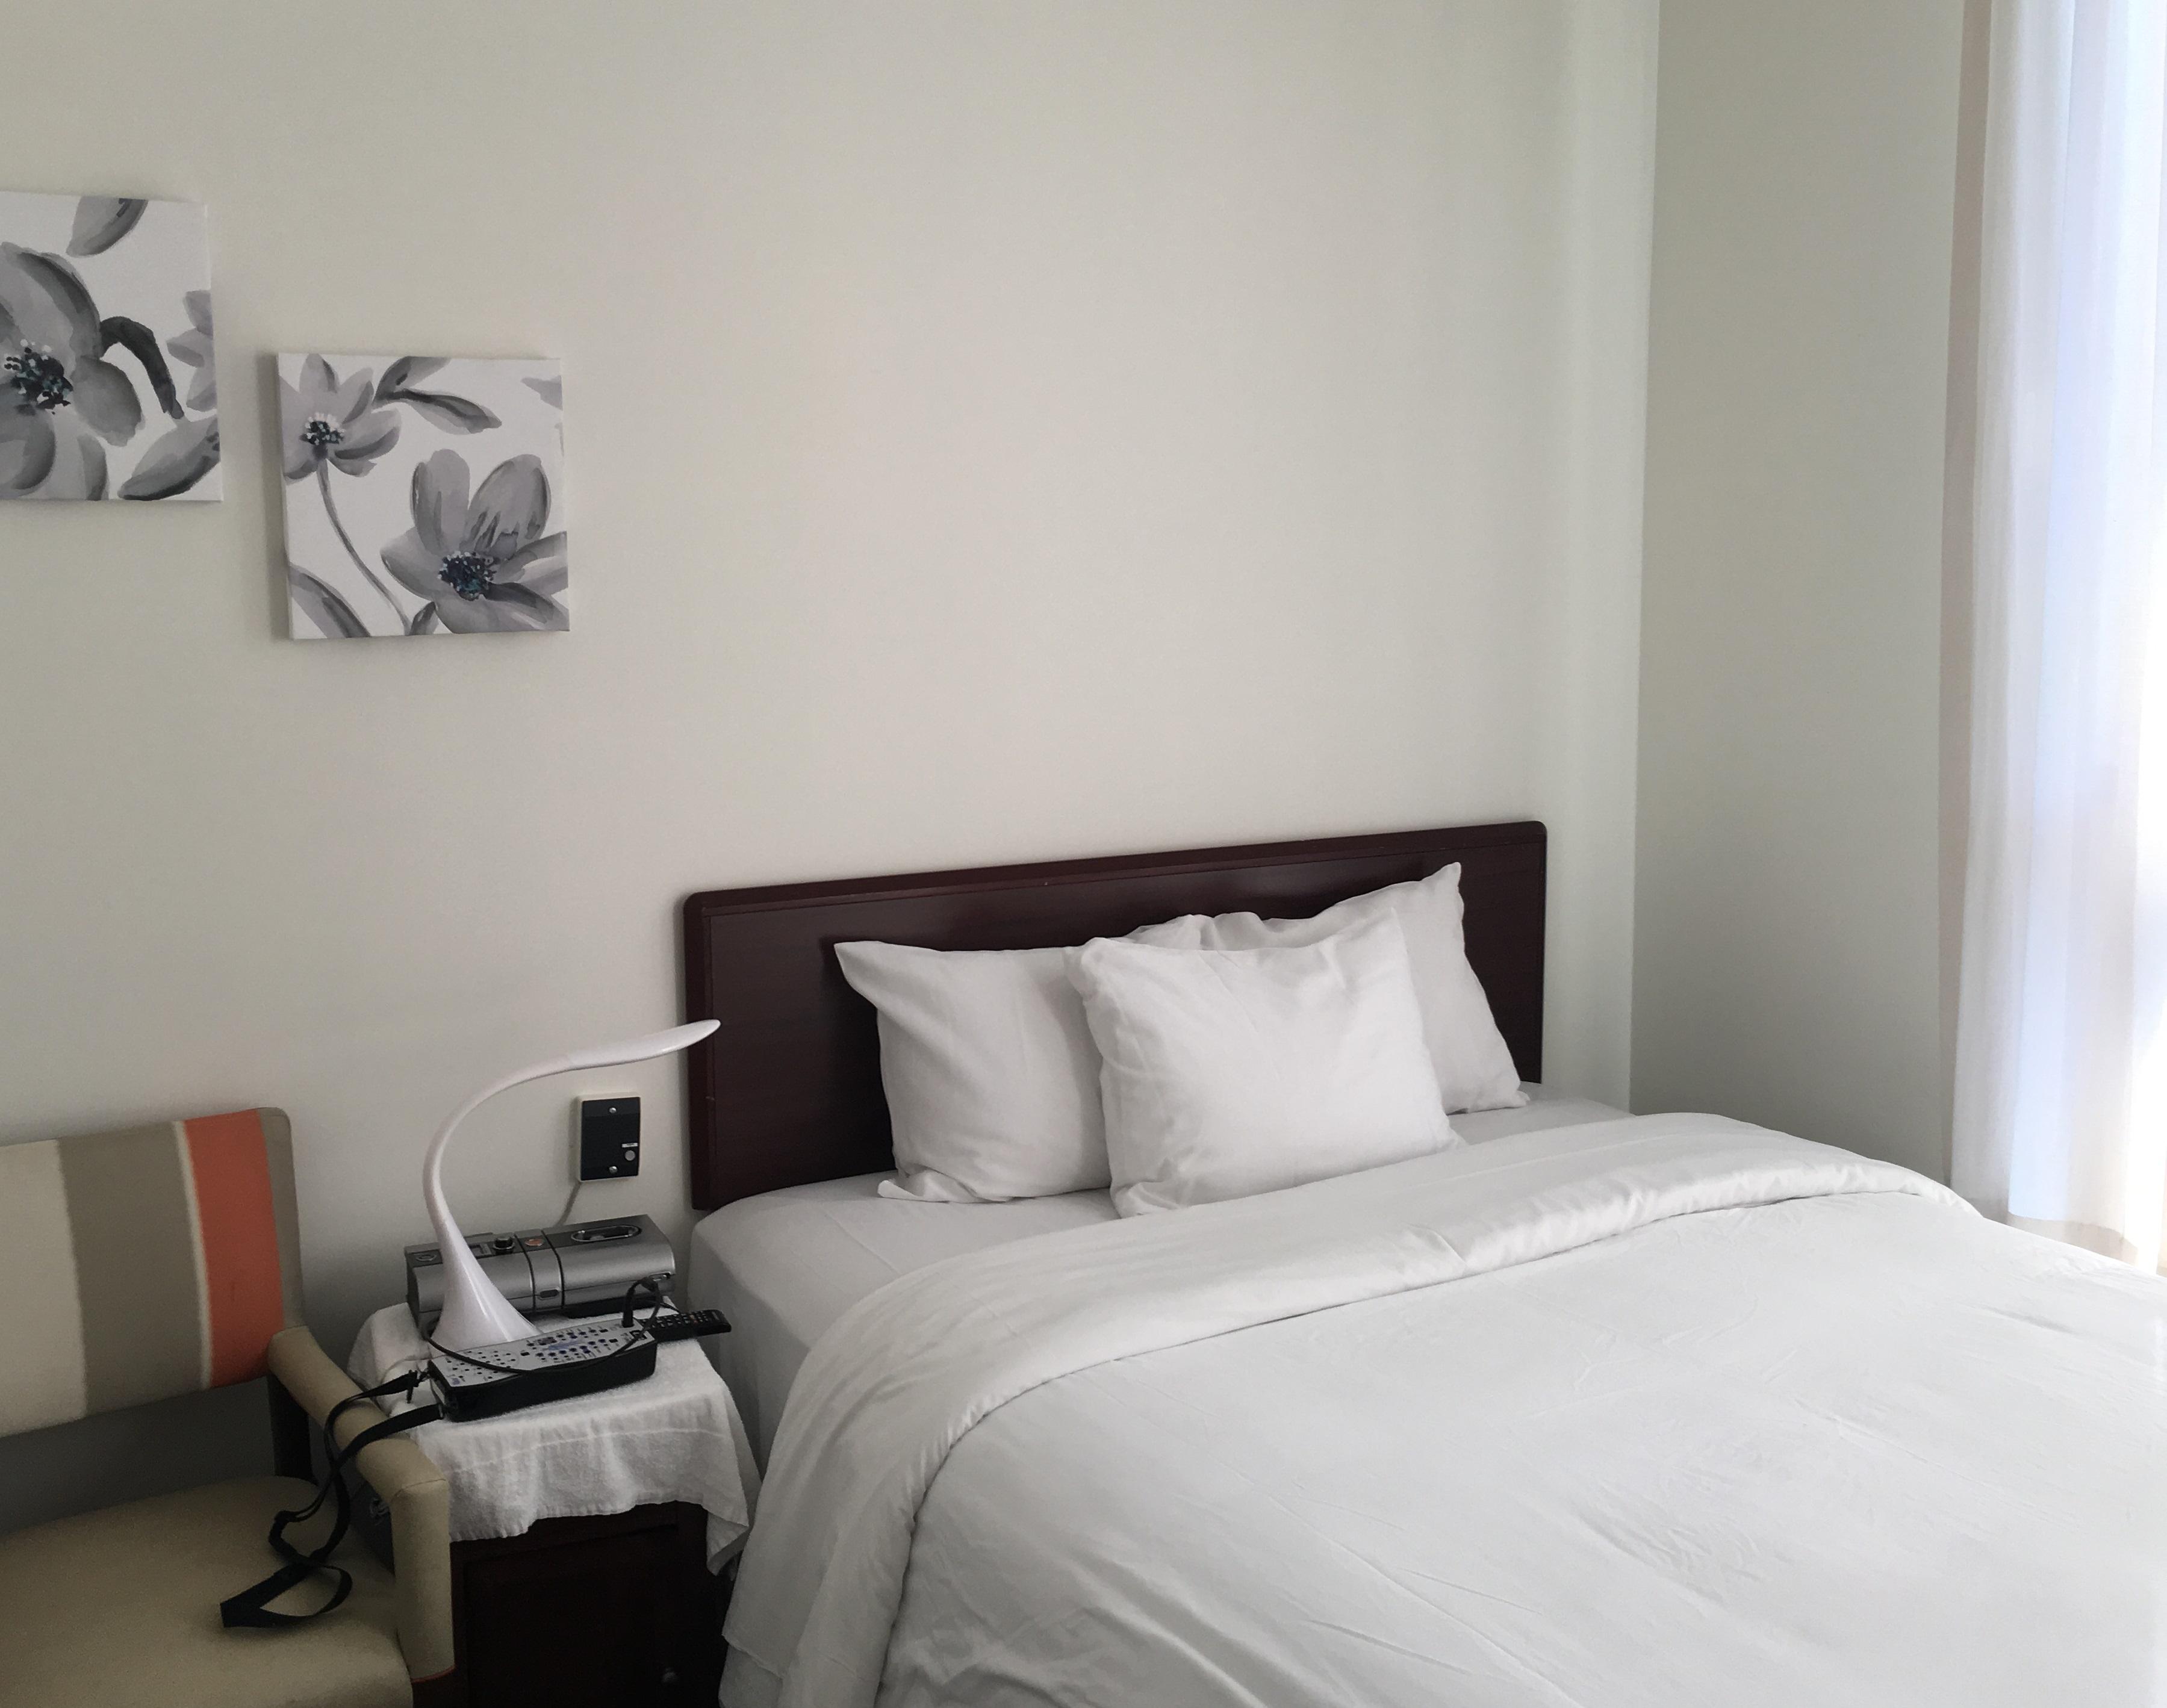 Pasadena sleep center - Advanced Sleep Medicine Services - room